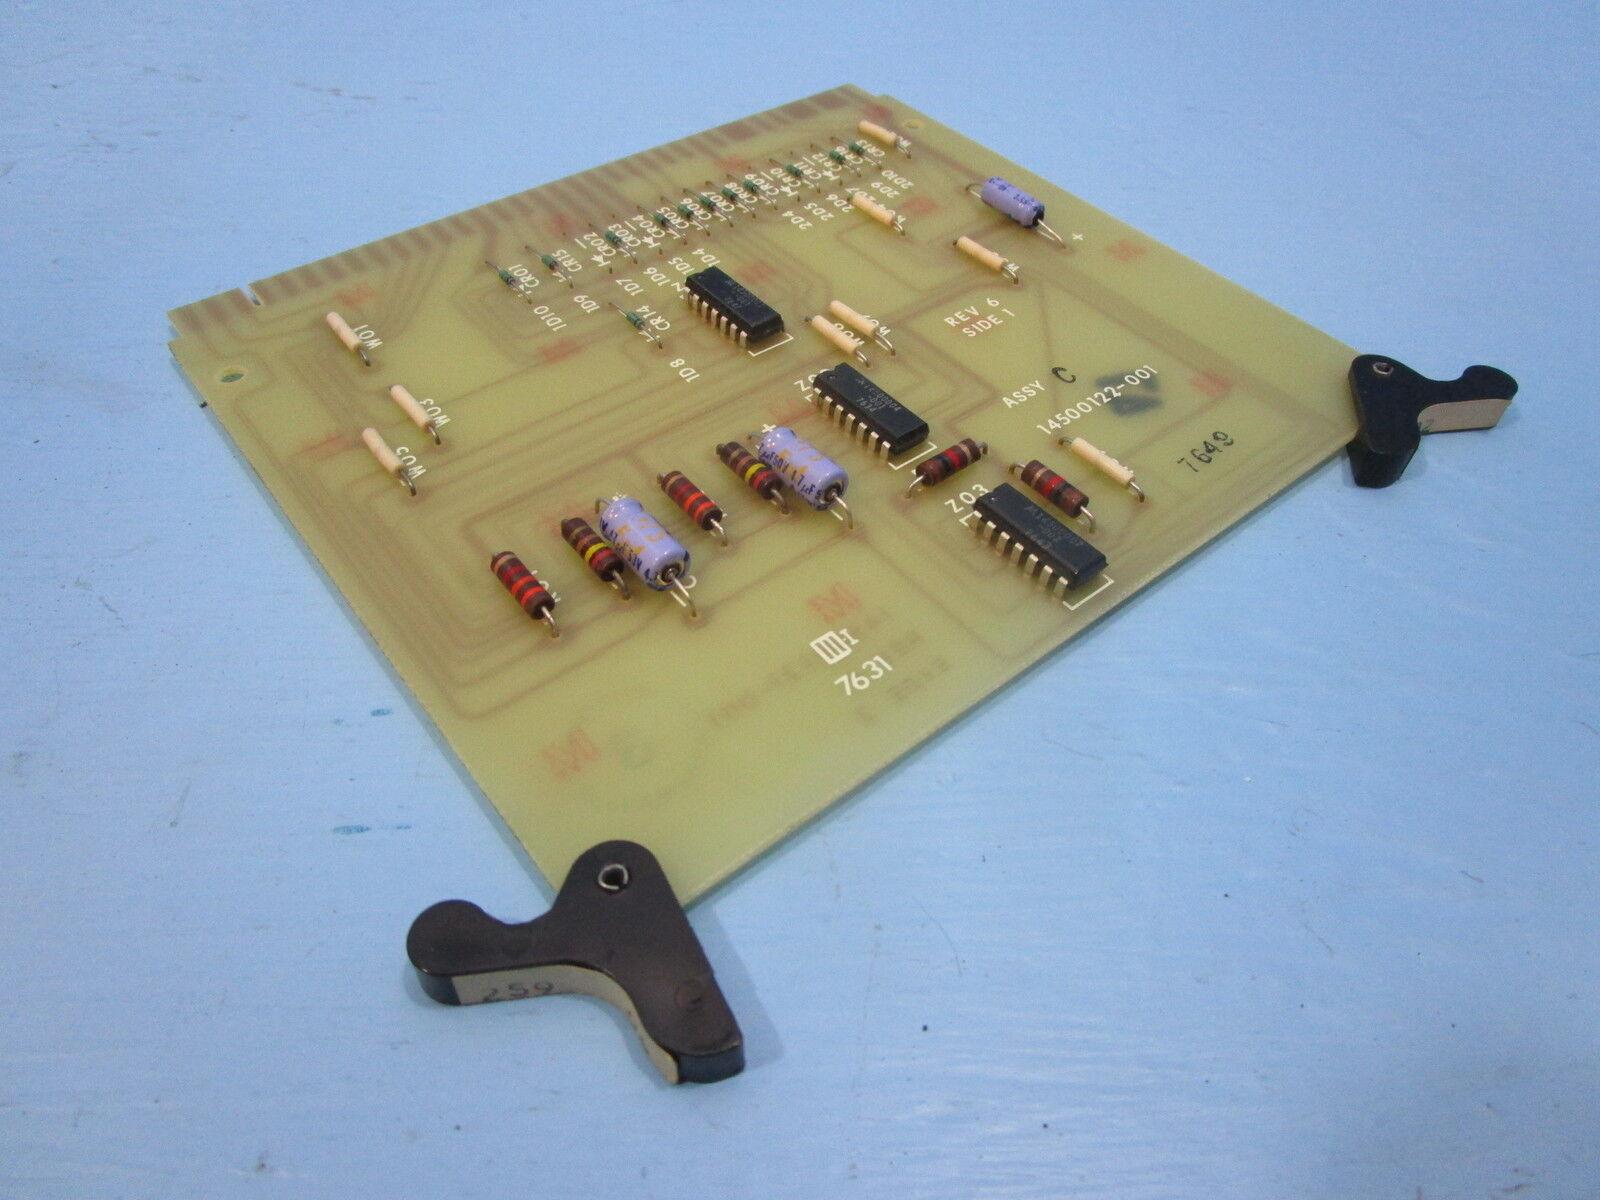 Honeywell 14500122-001 Module PLC PCB Board Rev 6 14500122001 14500121-001